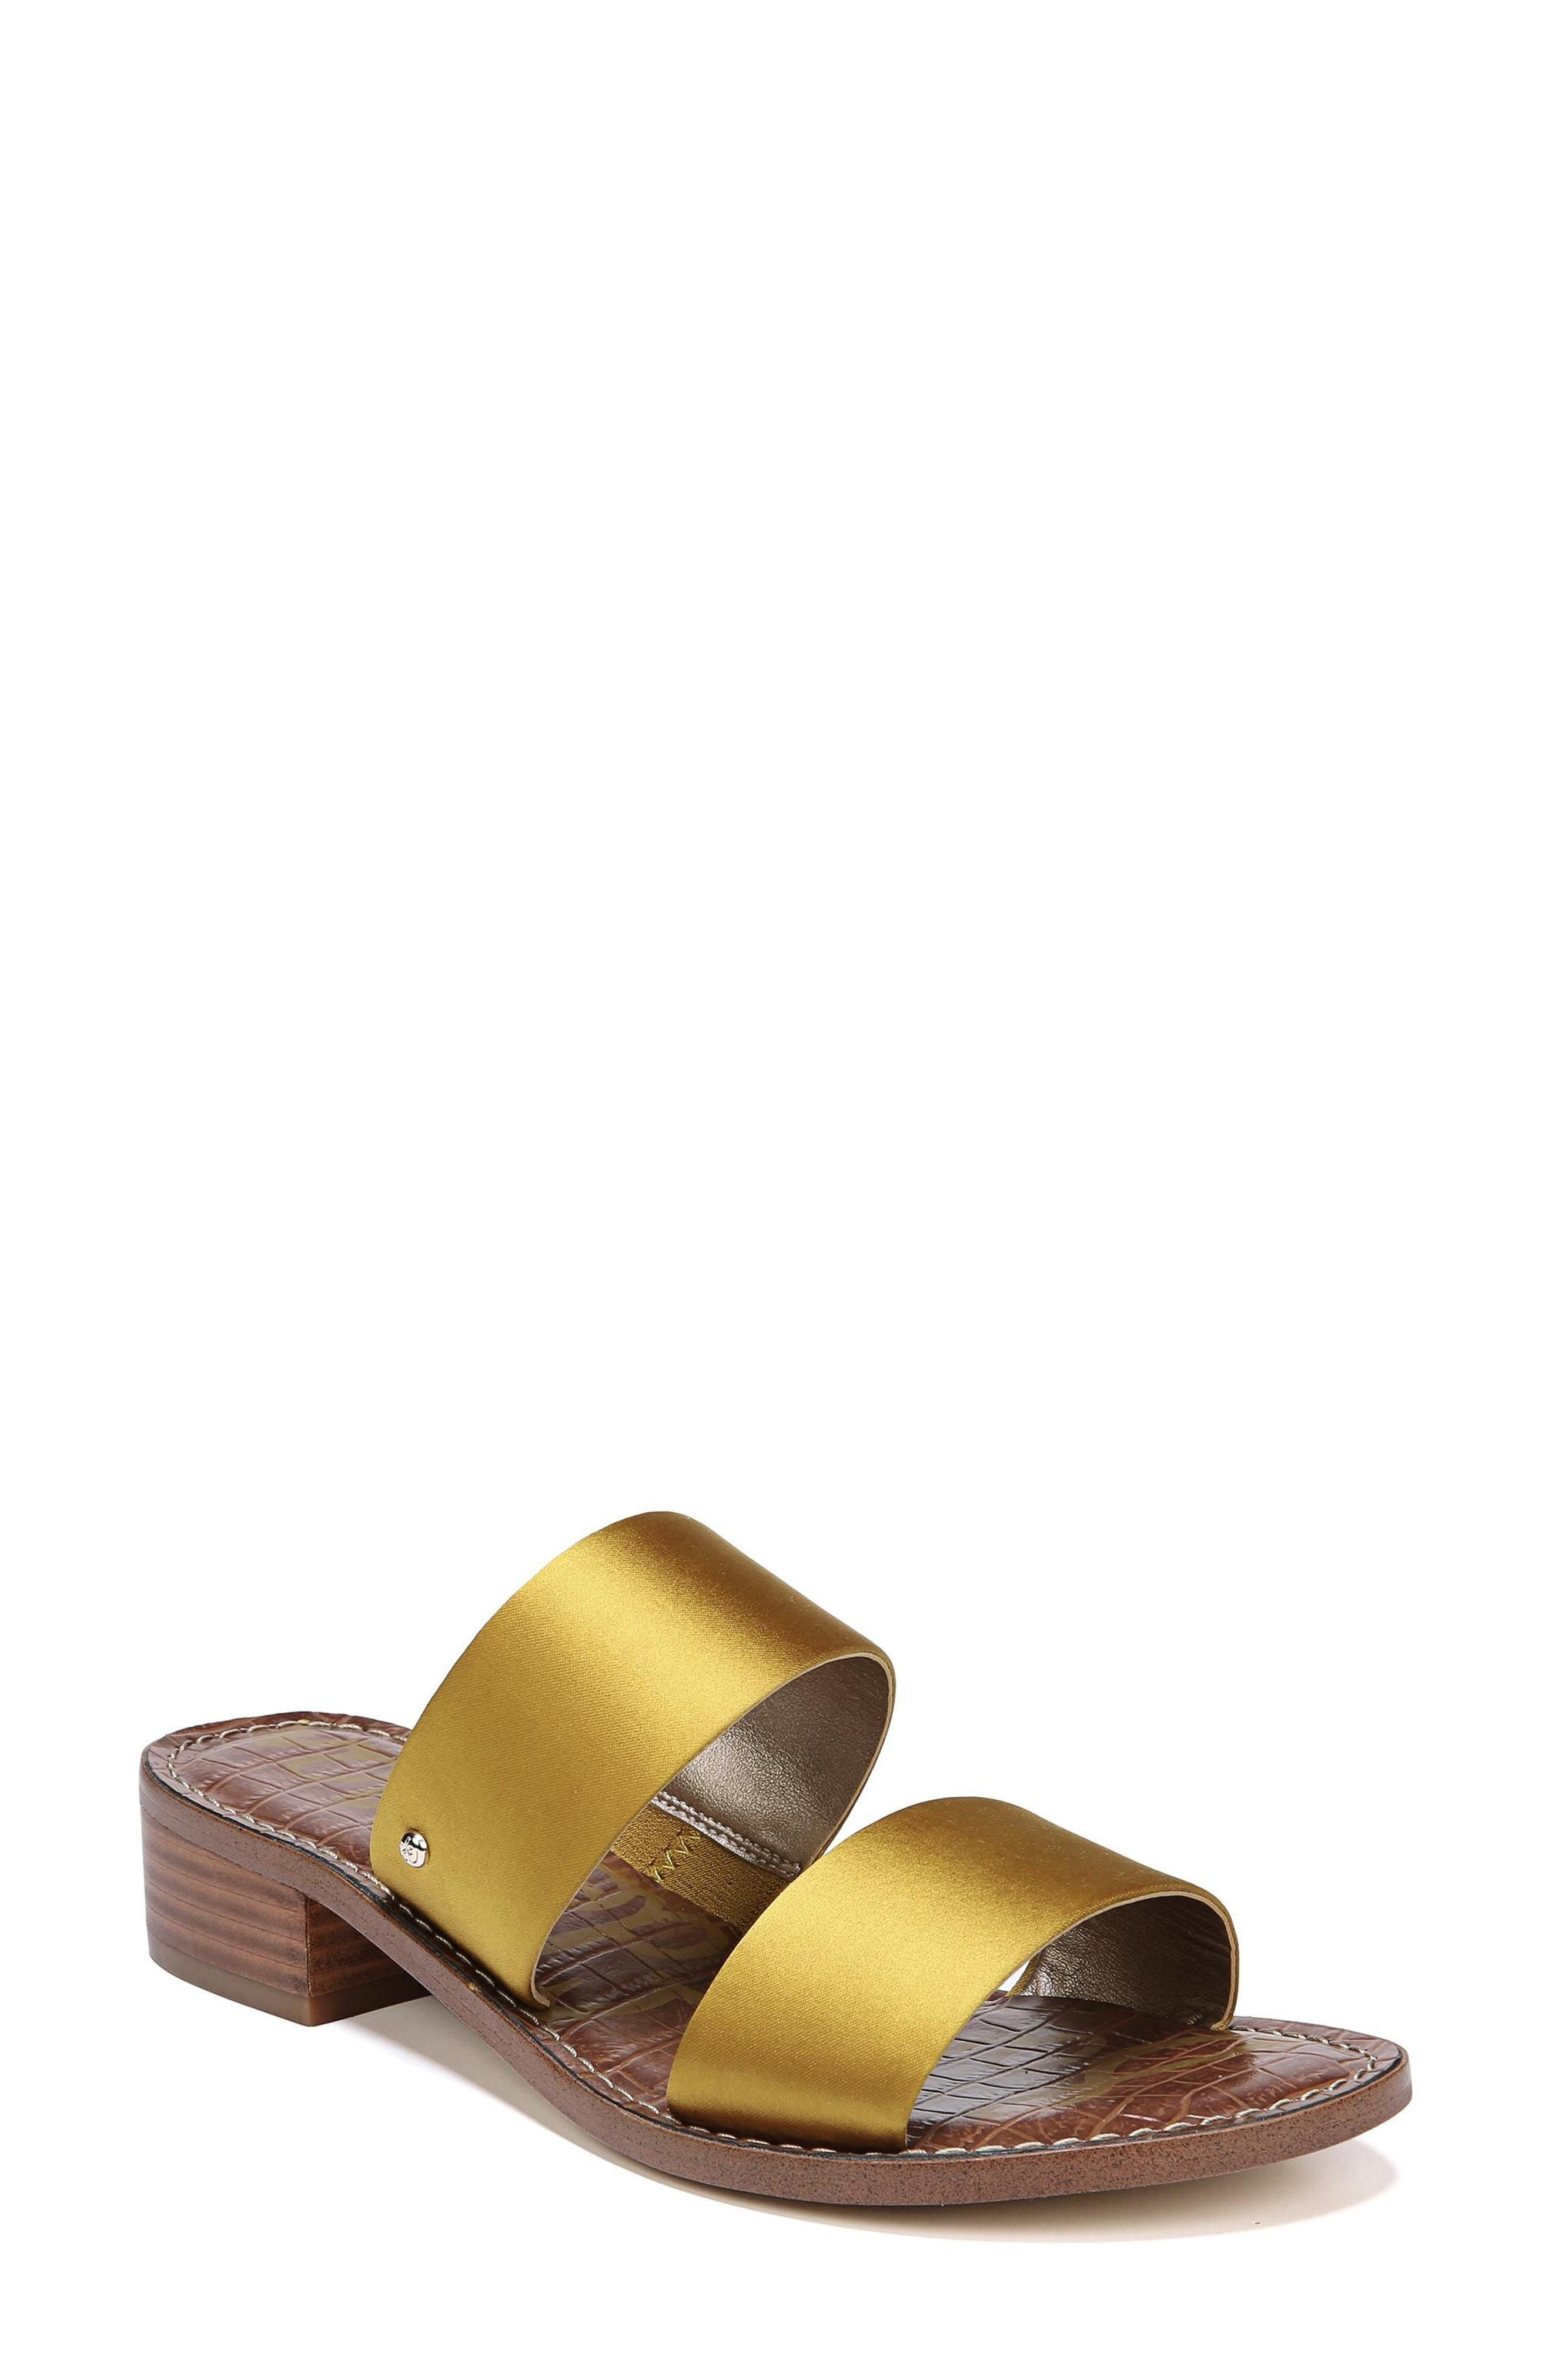 cf05b914403 Jeni Sandal. Yellow Satin Heeled Sandals by Sam Edelman